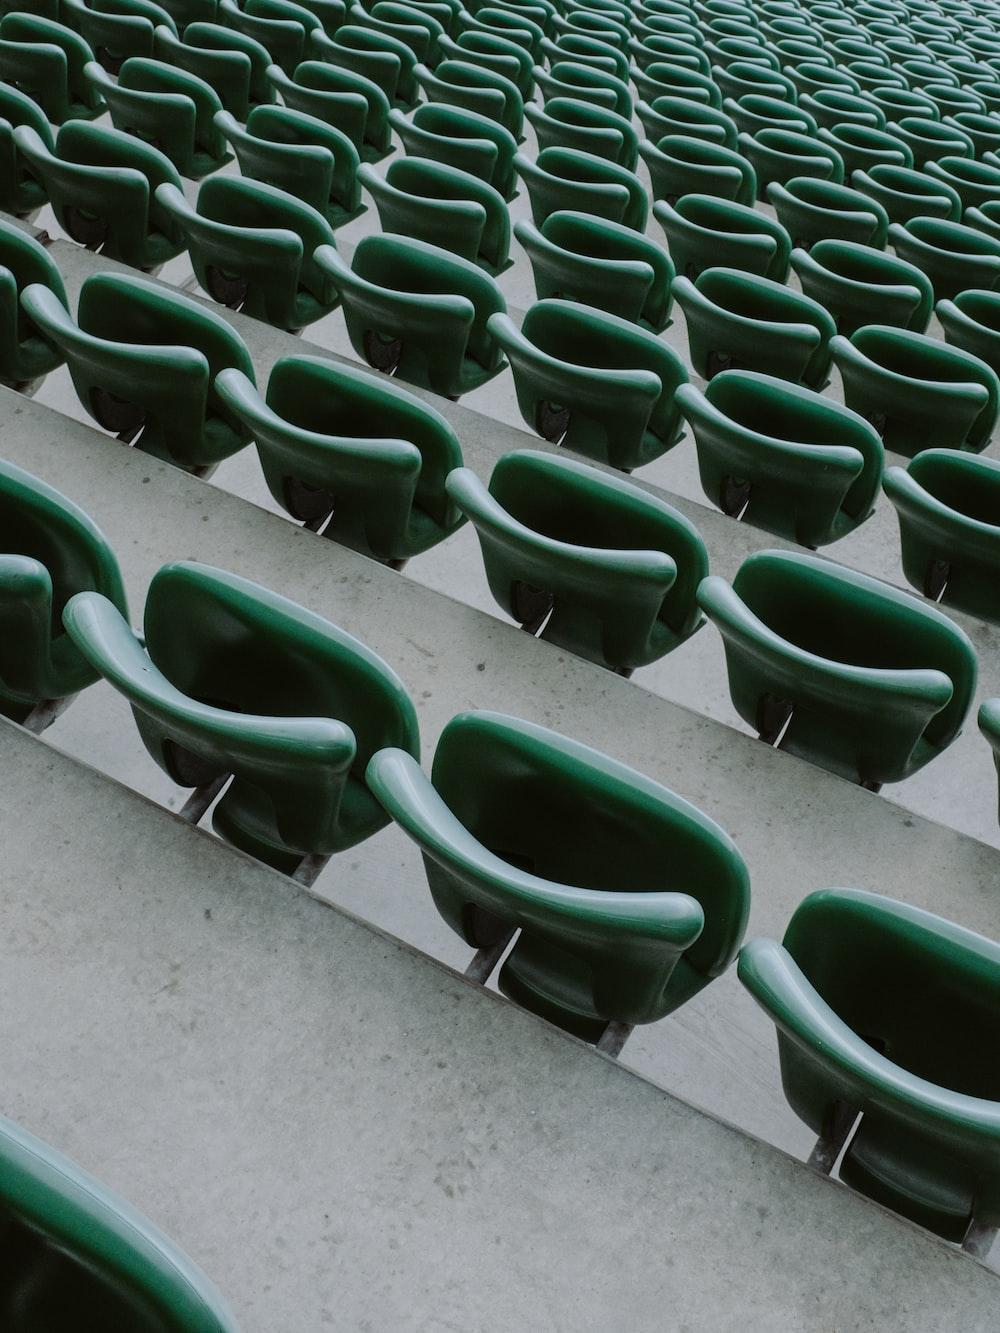 green plastic chairs on gray concrete floor